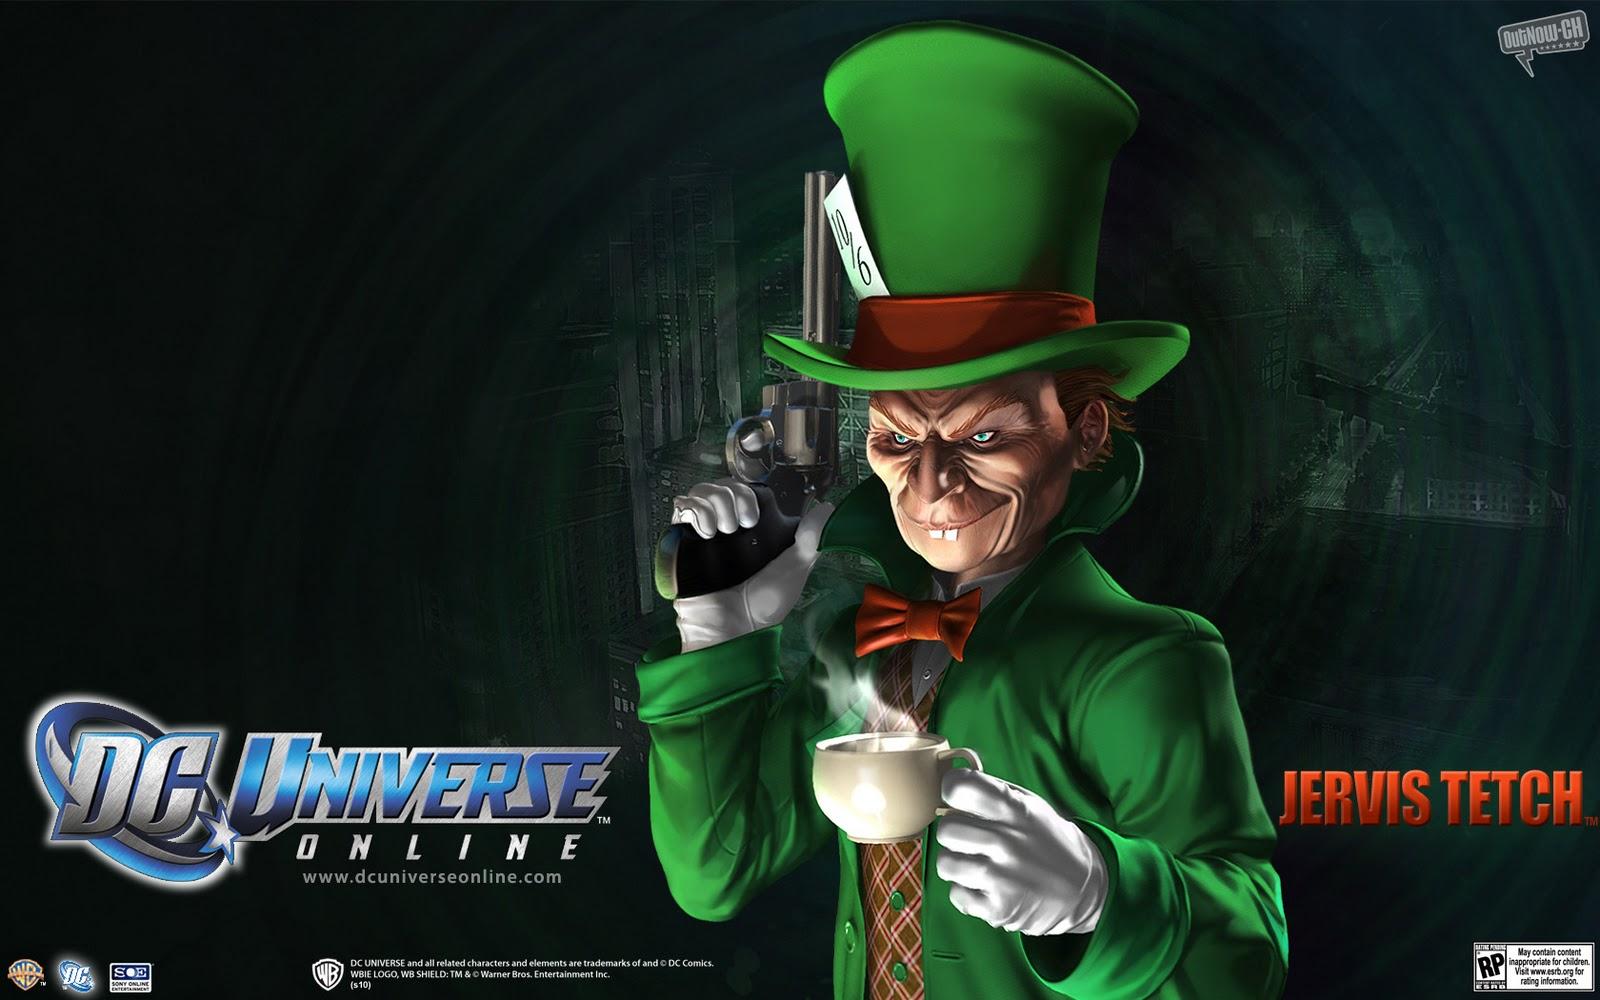 http://3.bp.blogspot.com/_NqLYfqfYn0k/TPvbVSphfHI/AAAAAAAAV7M/LG74tYTUWFE/s1600/I+Believe+hat.jpg